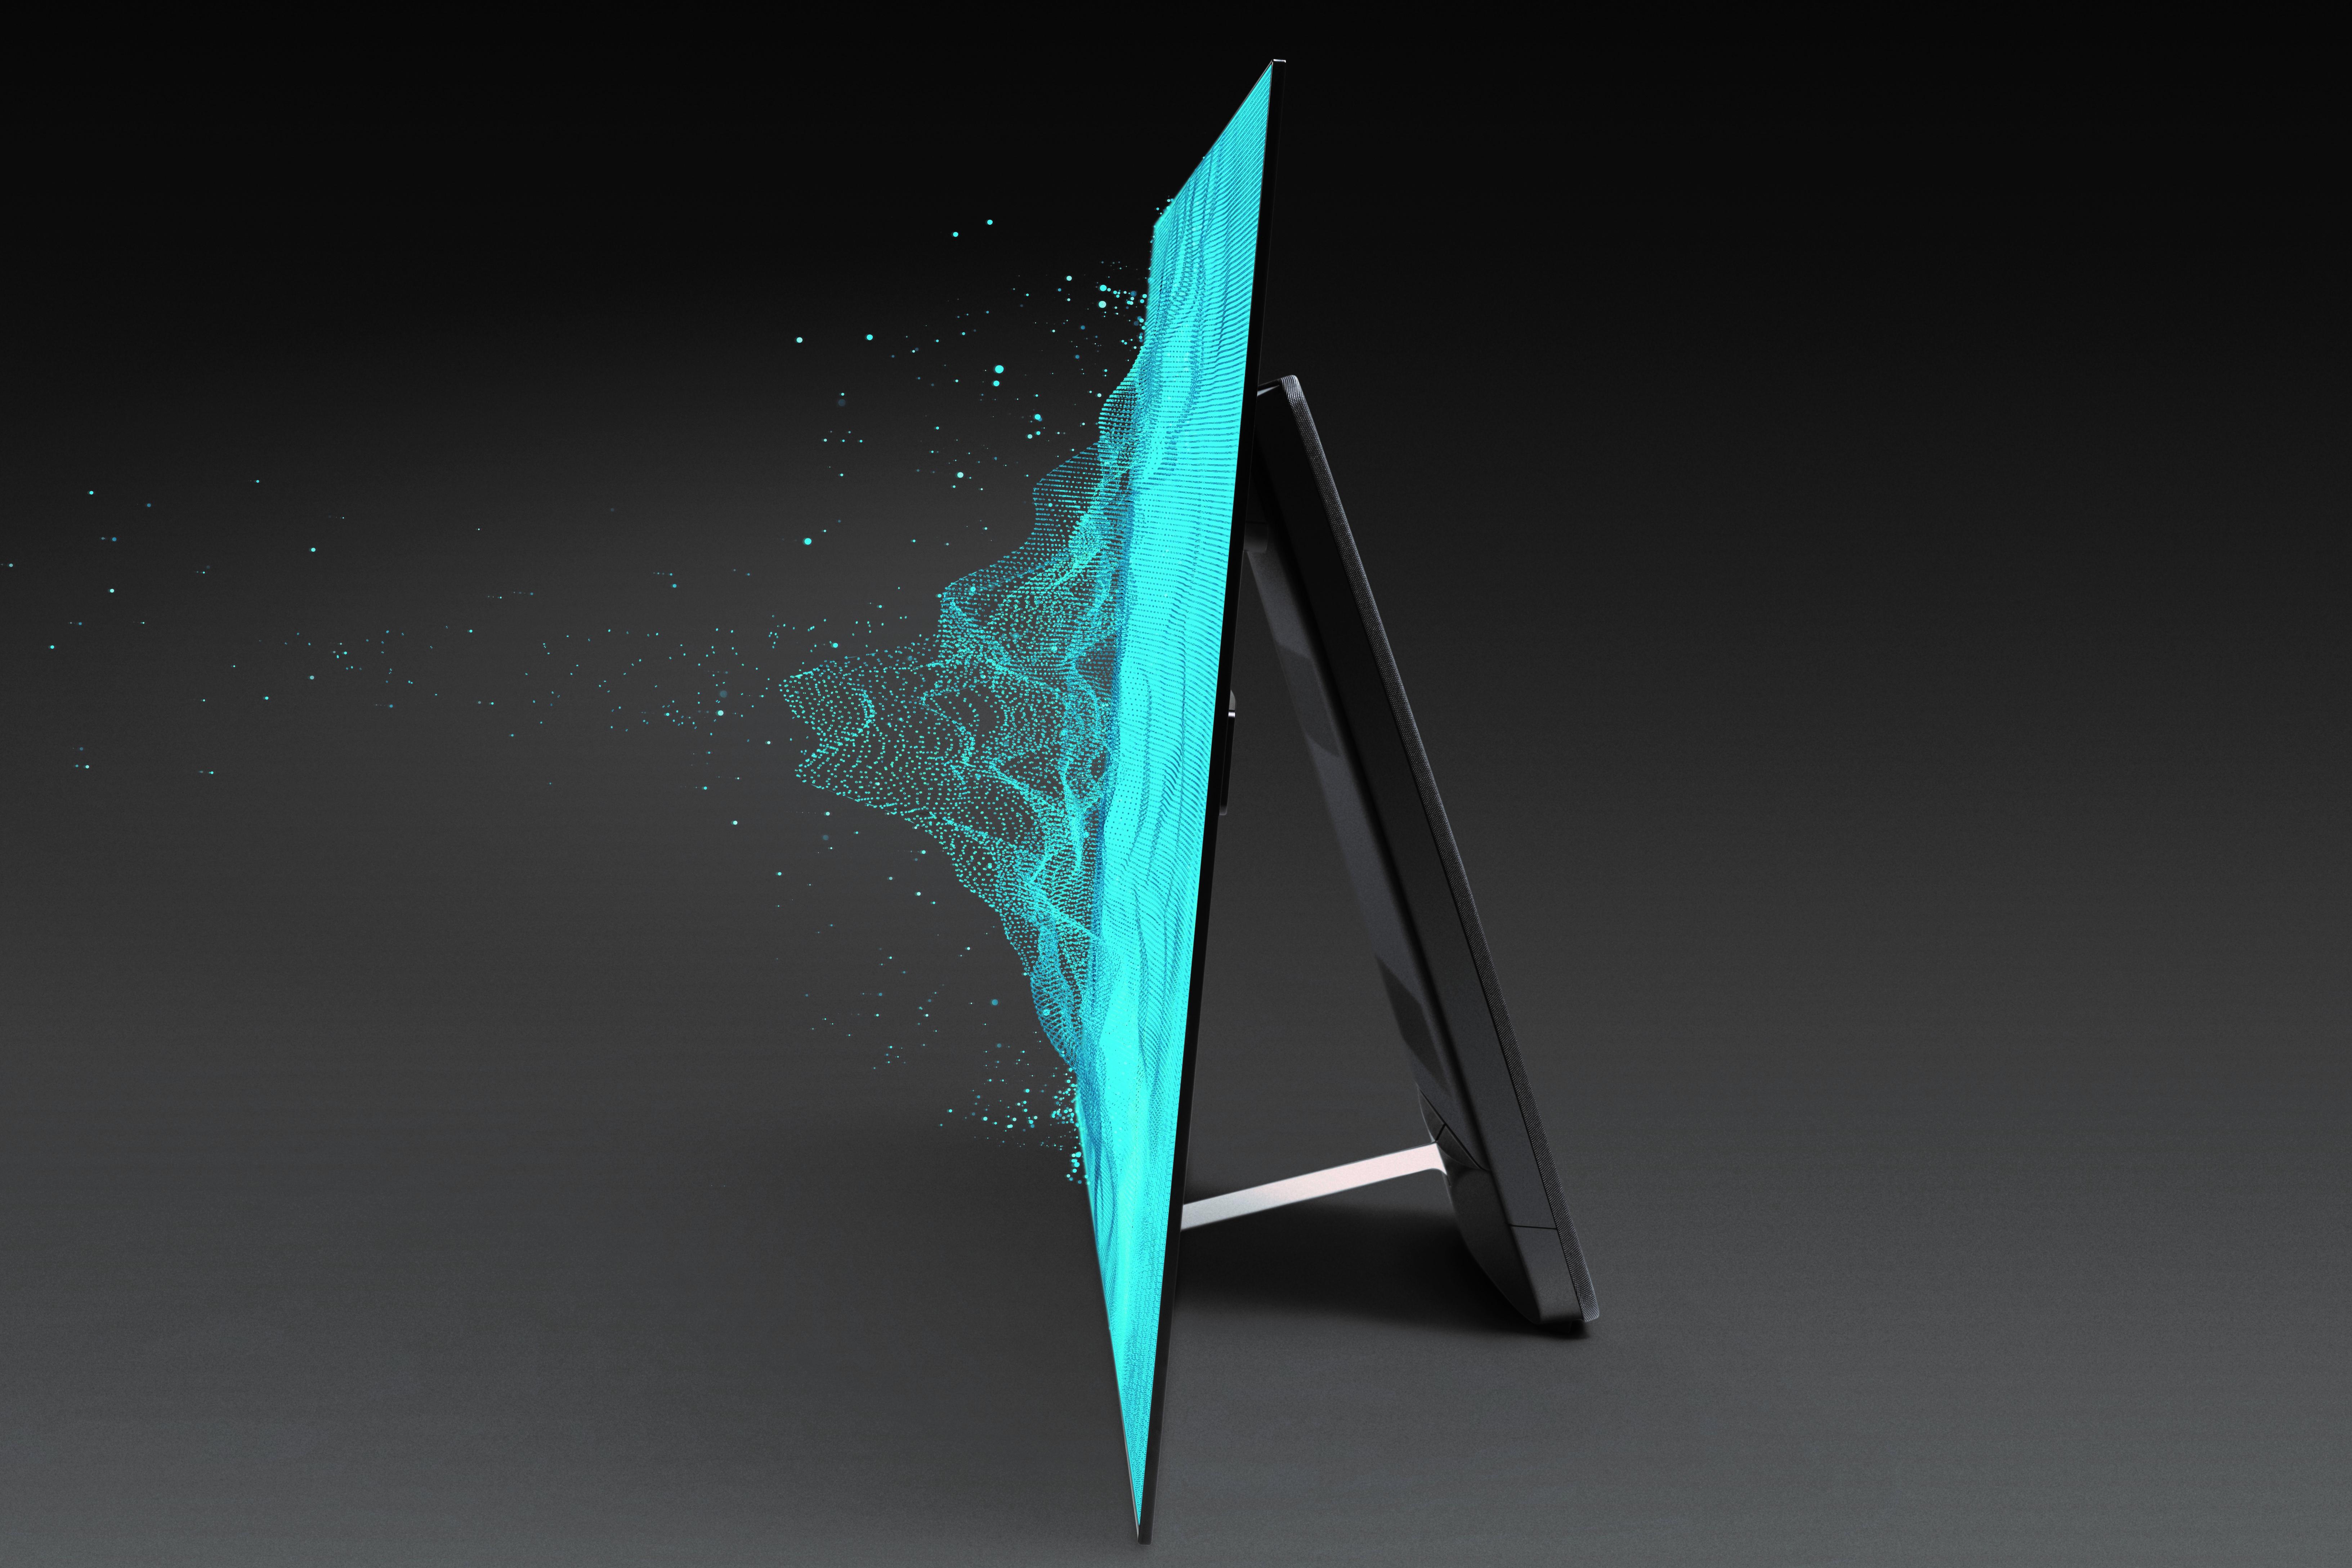 sony xbr65a1e 65 inch 4k ultra hd smart bravia oled tv 2017 model 27242906815 ebay. Black Bedroom Furniture Sets. Home Design Ideas